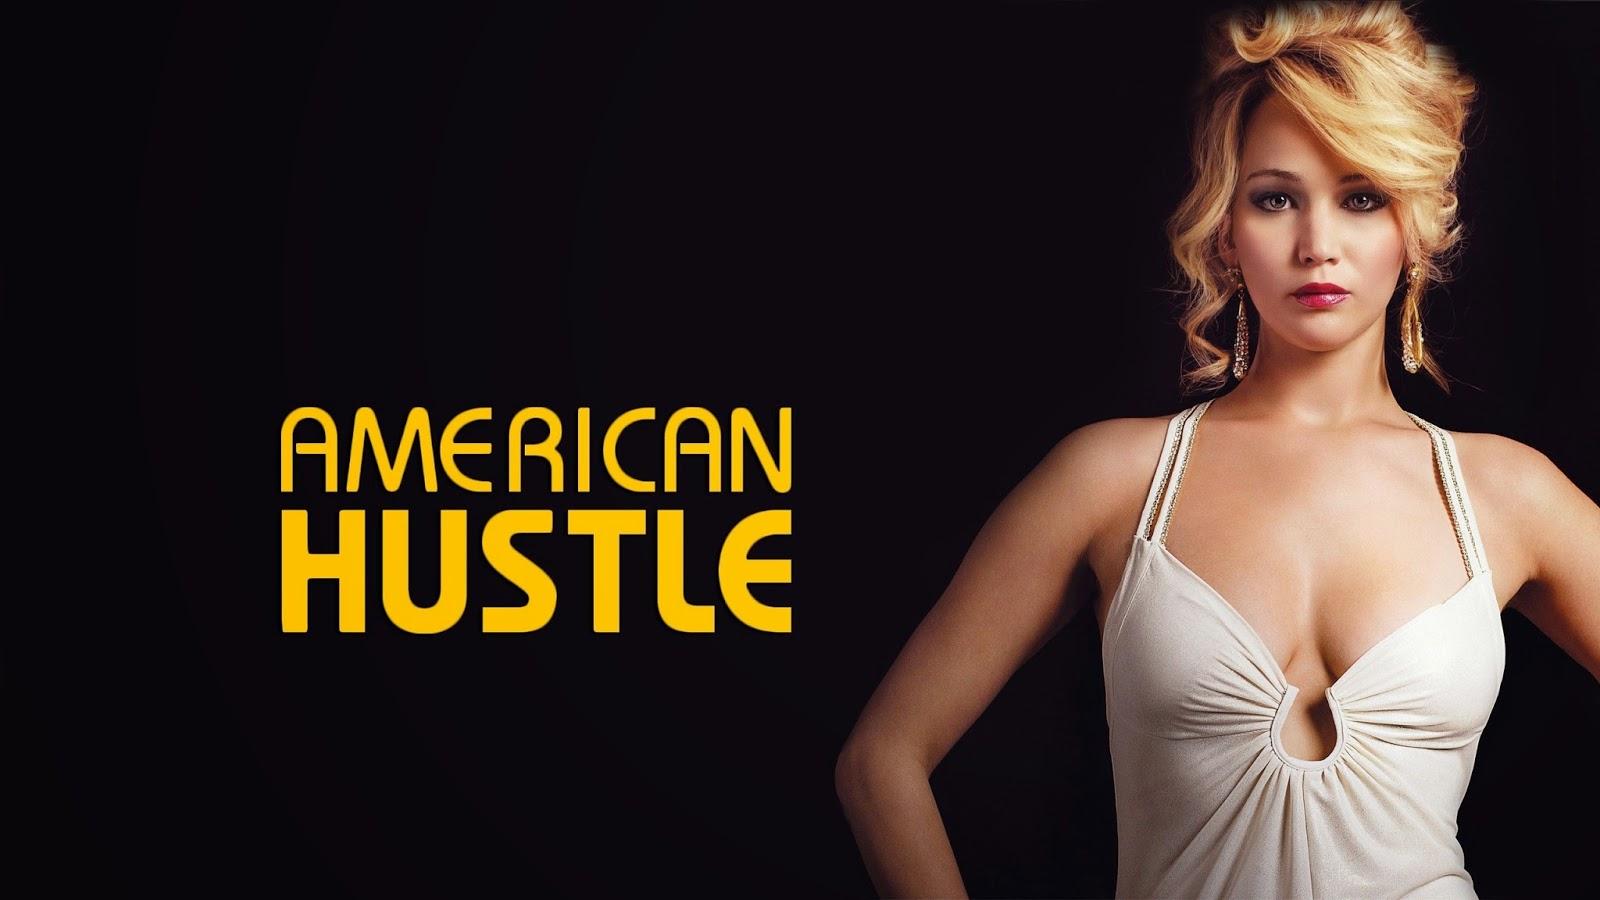 American ladies photos